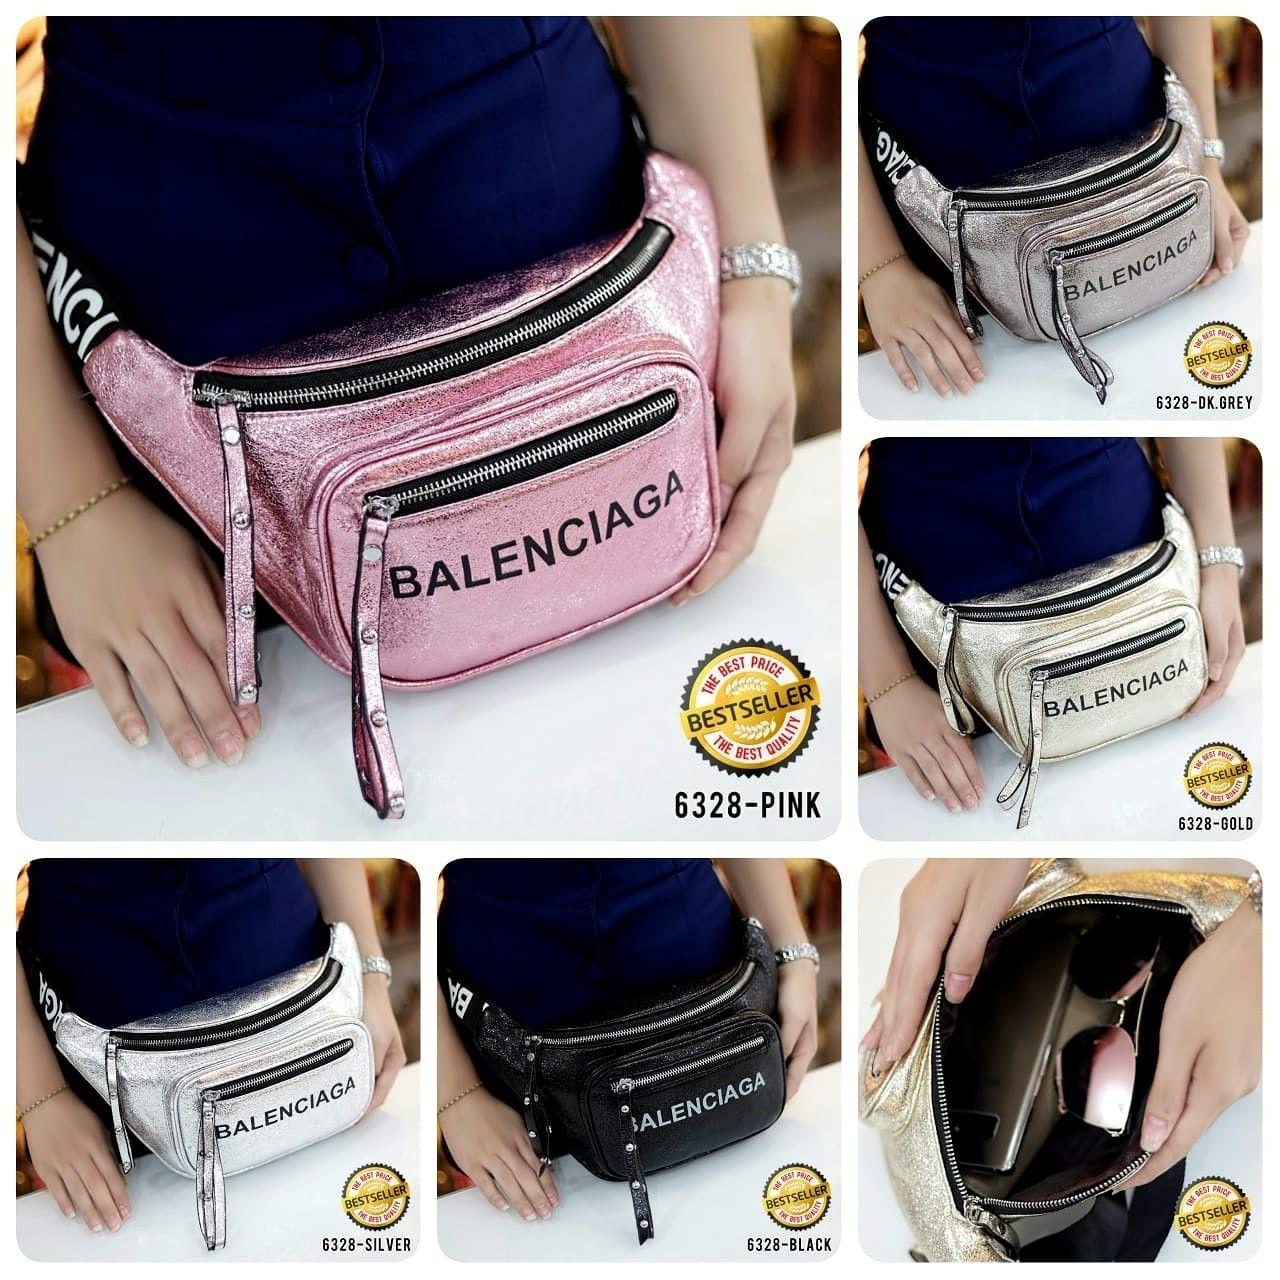 Balenciaga BumBag 6328  Bag multi fungsi - tas Pinggang - tas Punggung - tas  Dada 66f7baa325